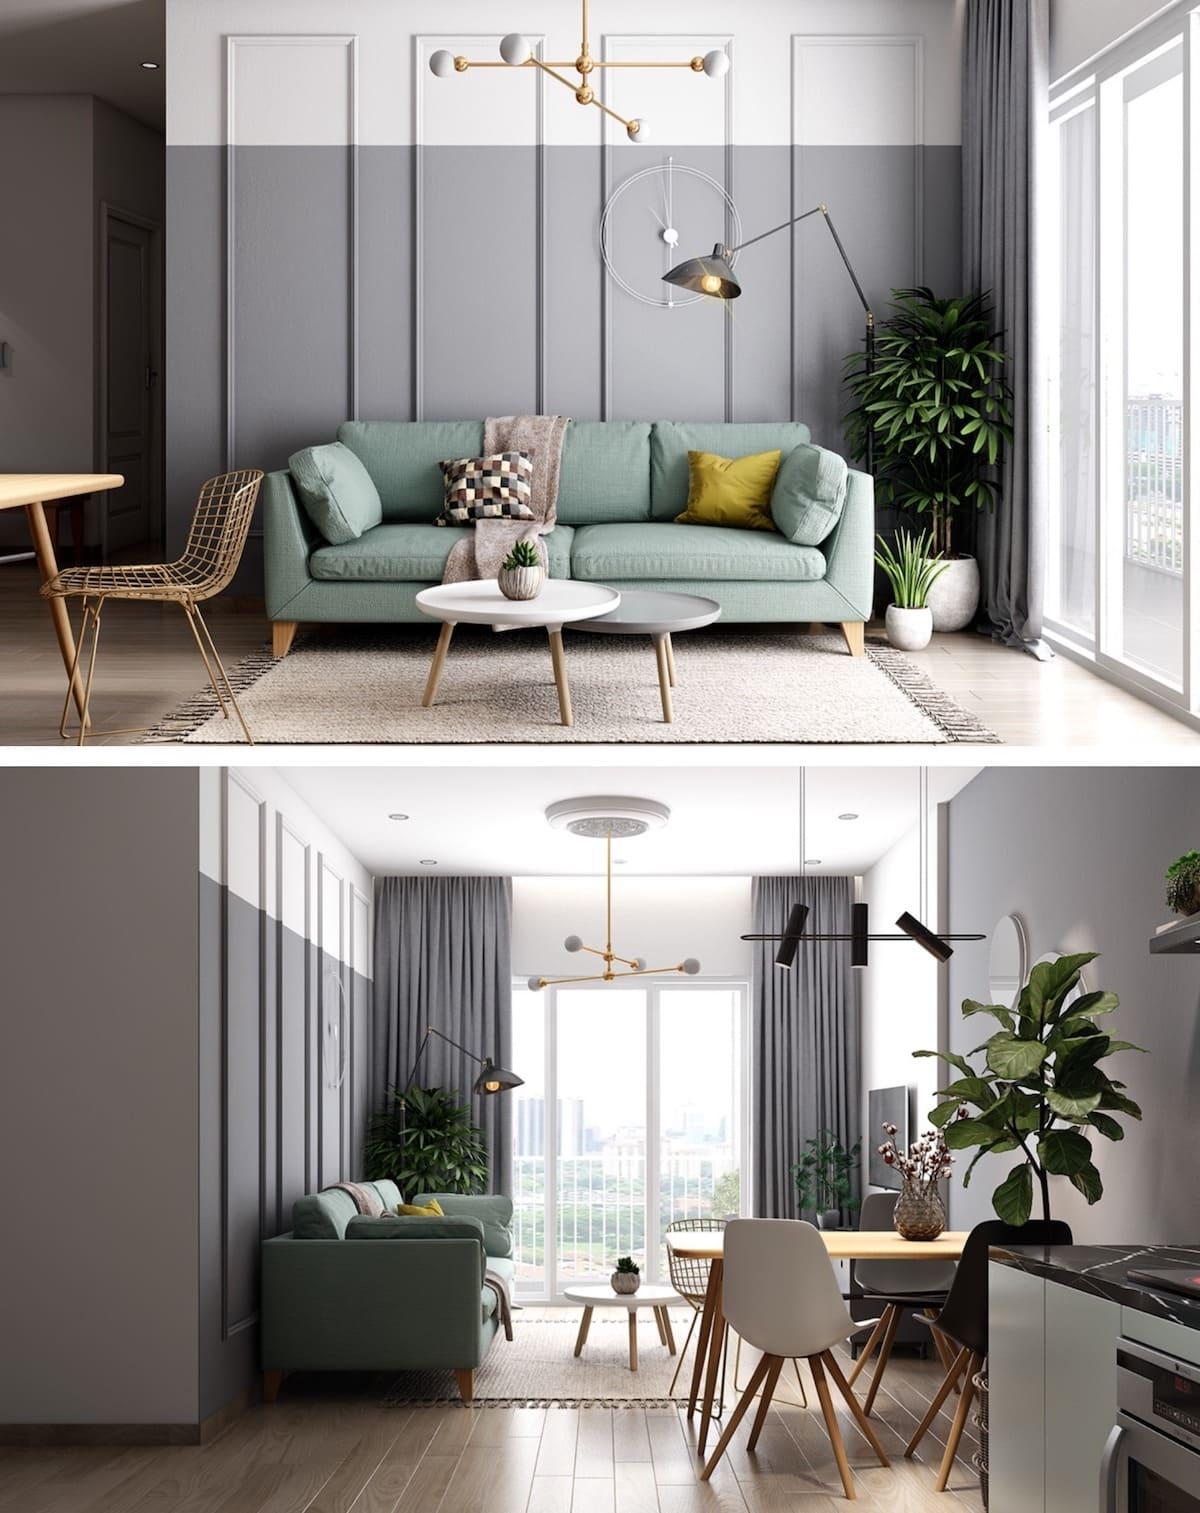 дизайн интерьера модной квартиры фото 74